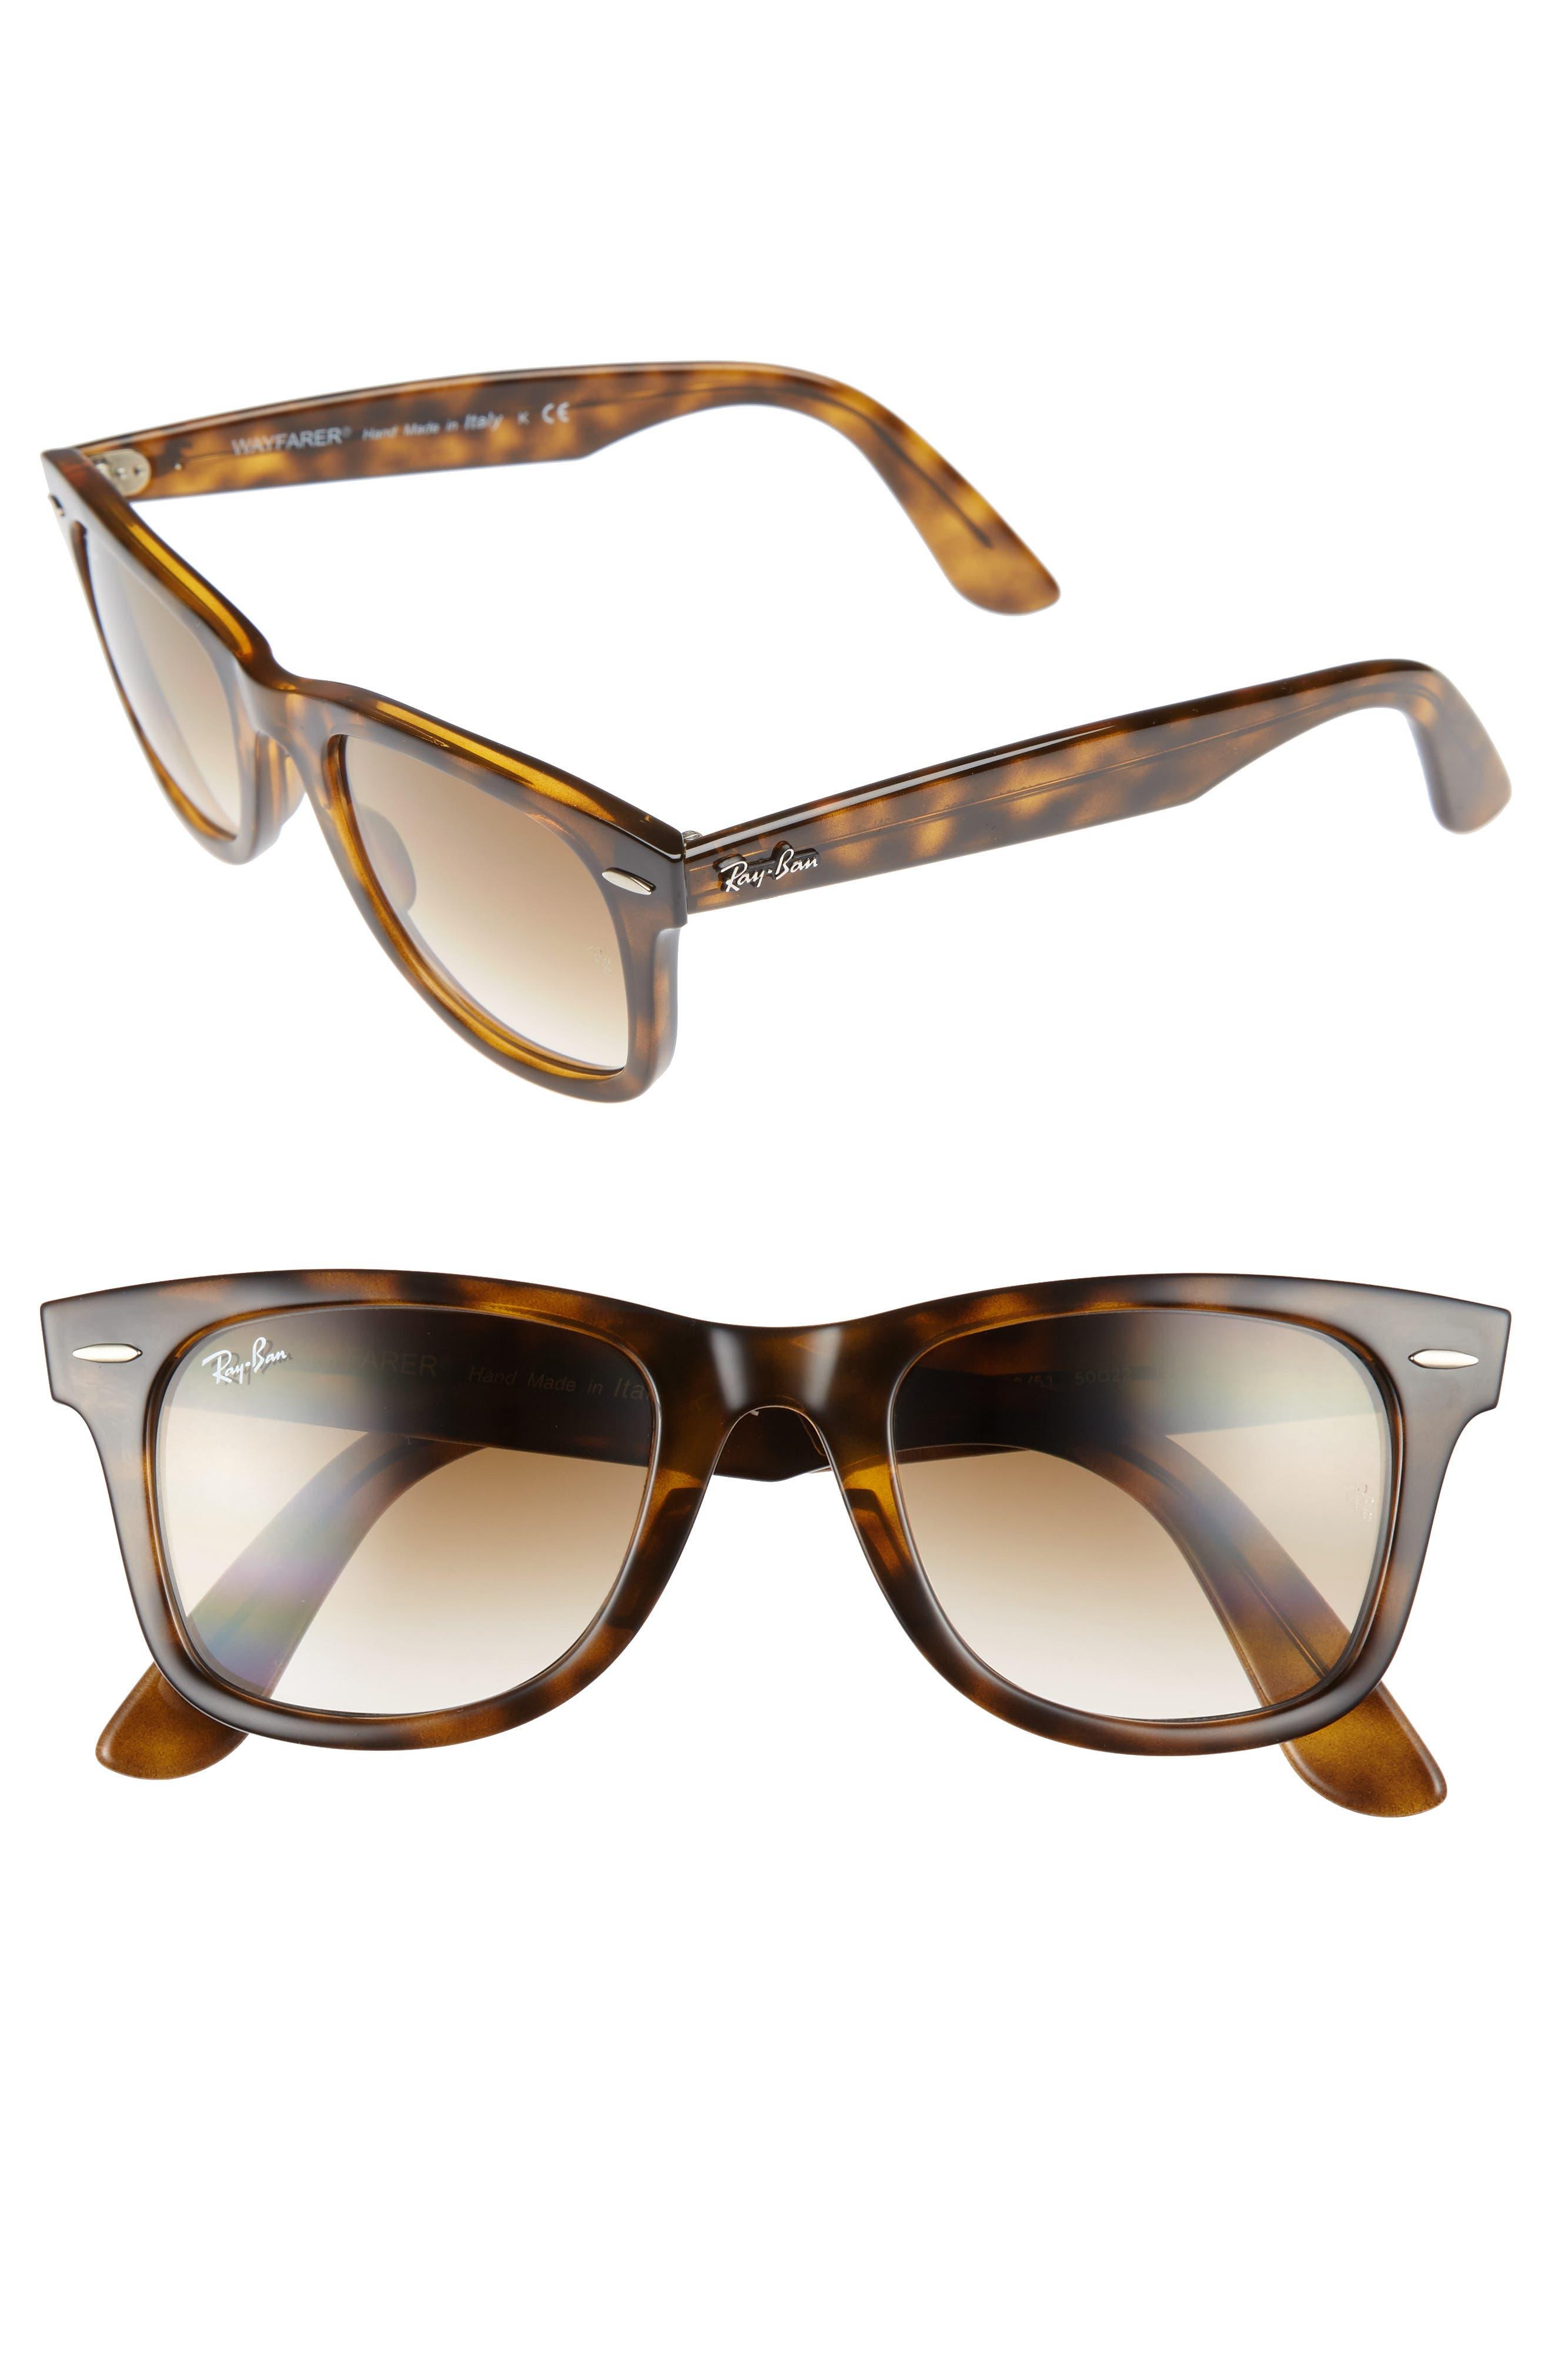 Main Image - Ray-Ban 50mm Wayfarer Ease Gradient Sunglasses